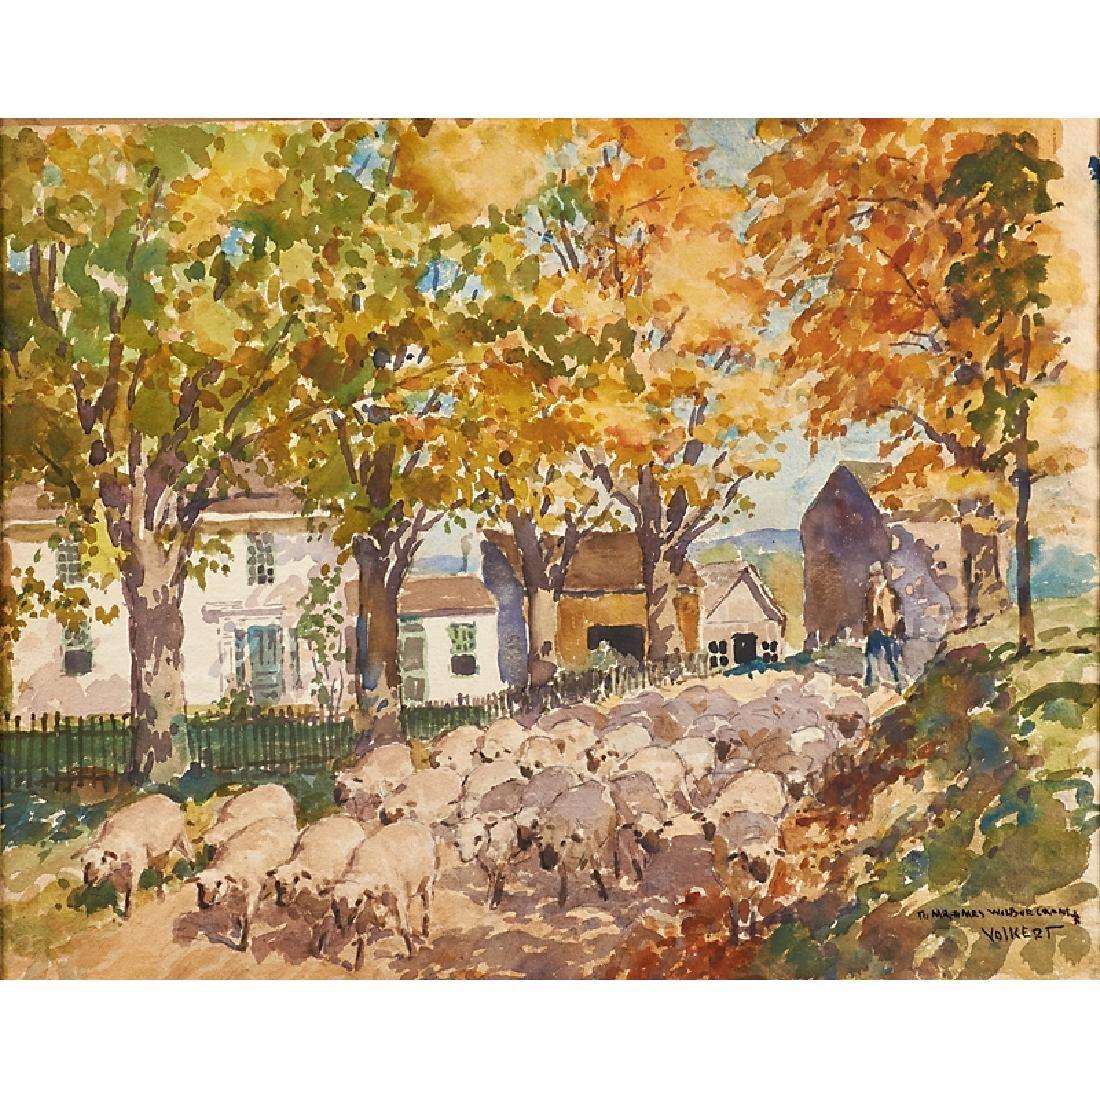 Edward Volkert (American, 1871-1935)